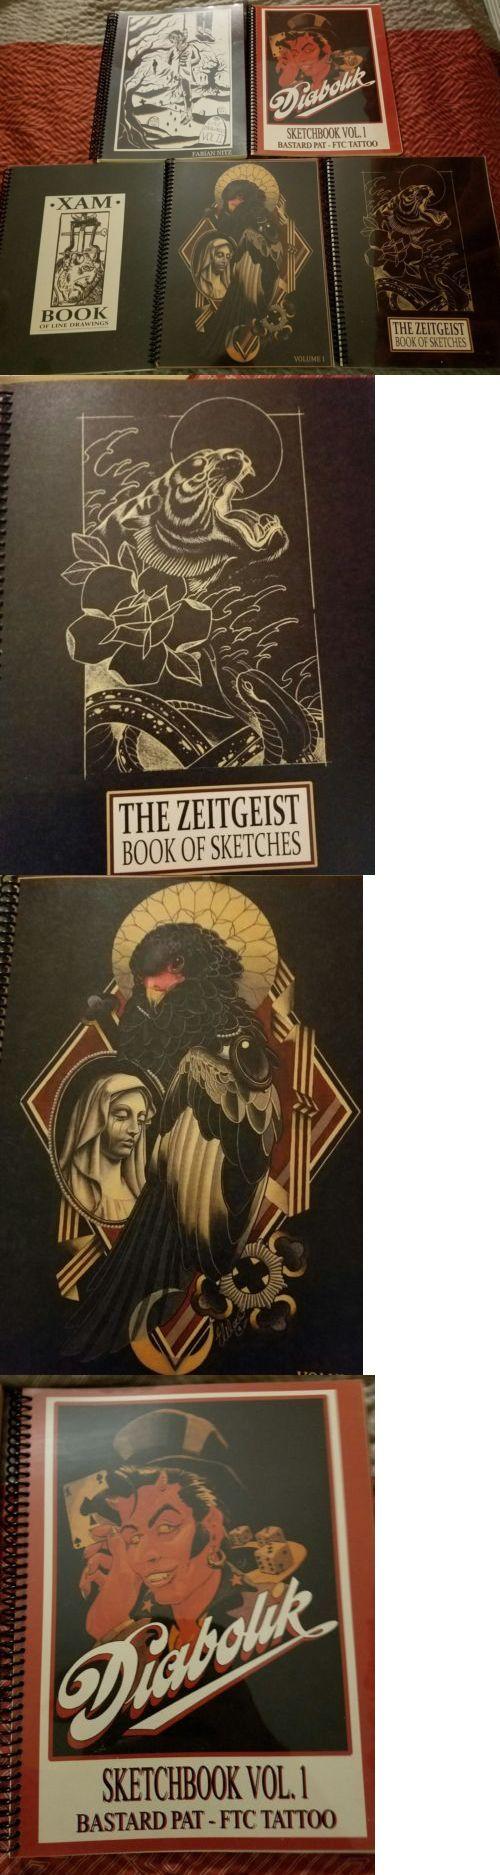 Tattoo Flash: Tattoo Sketchbook Flash Book Collection Xam, Emily Wood, Zeitgeist Diabolic(K) -> BUY IT NOW ONLY: $80 on eBay!